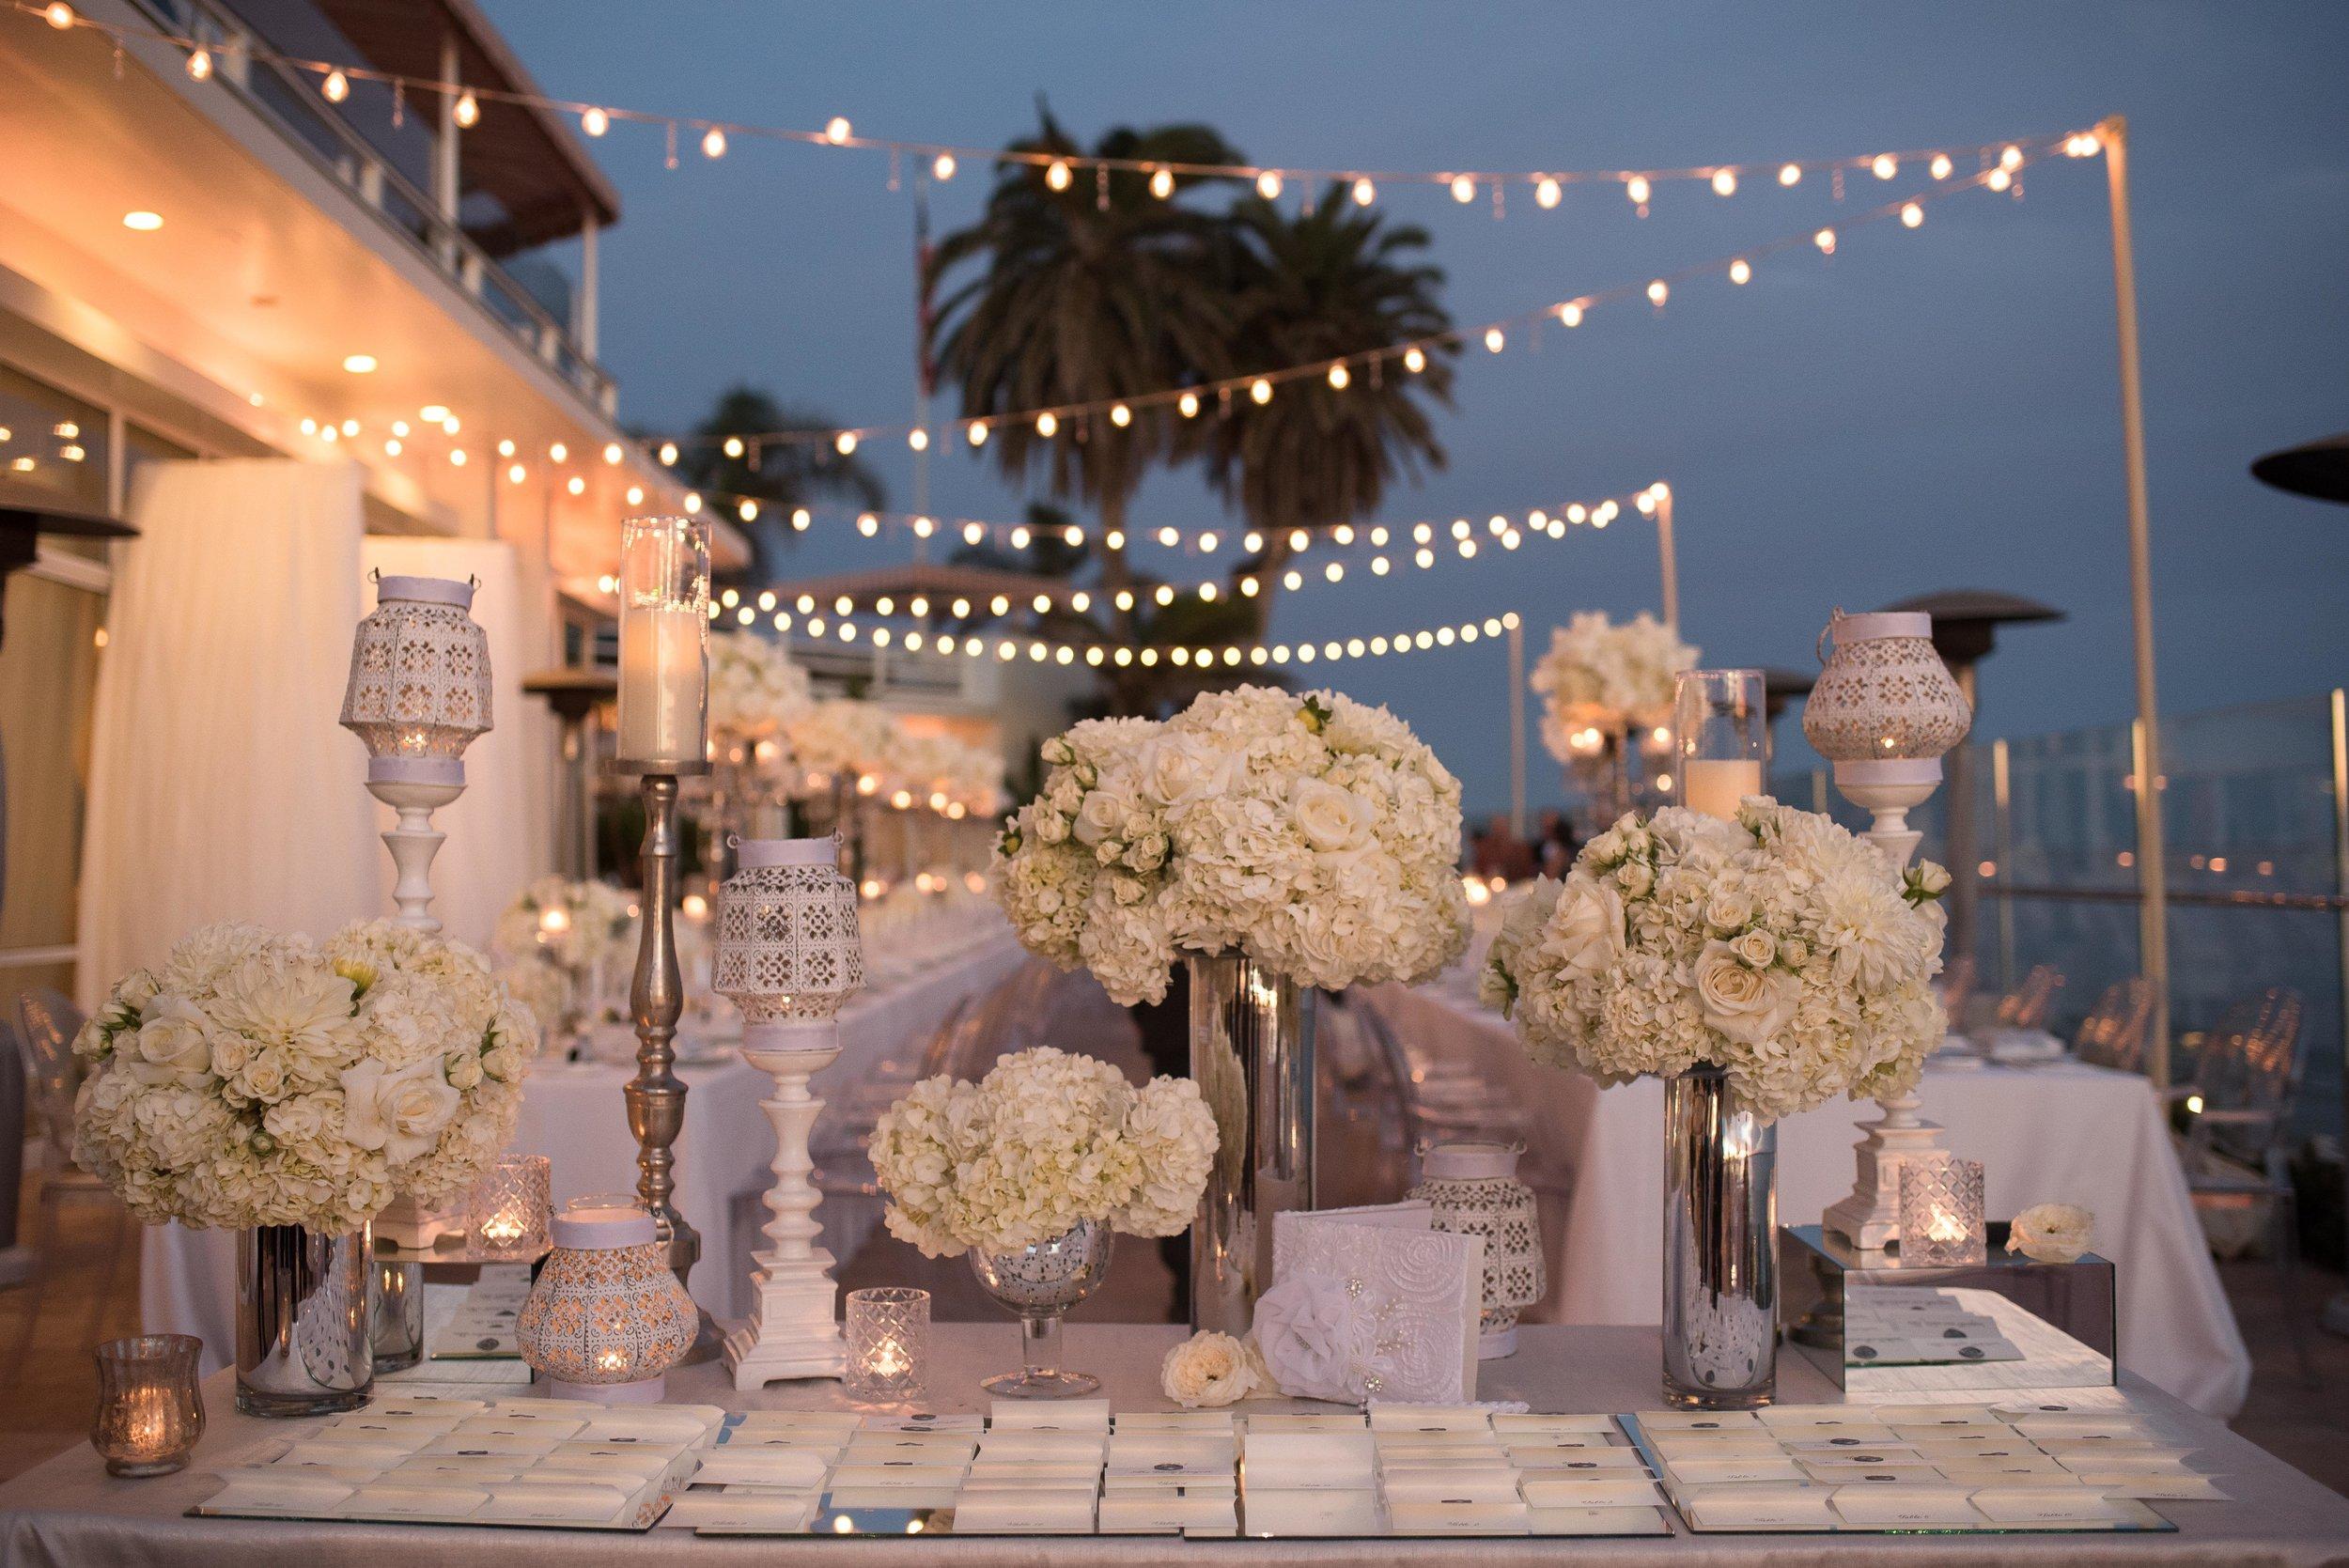 www.santabarbarawedding.com | Nate & Jenny Weddings | Four Seasons Resort The Biltmore | Ann Johnson Events | Florals by NICO | La Tavola | Bella Vista Designs | Wedding Reception Decor